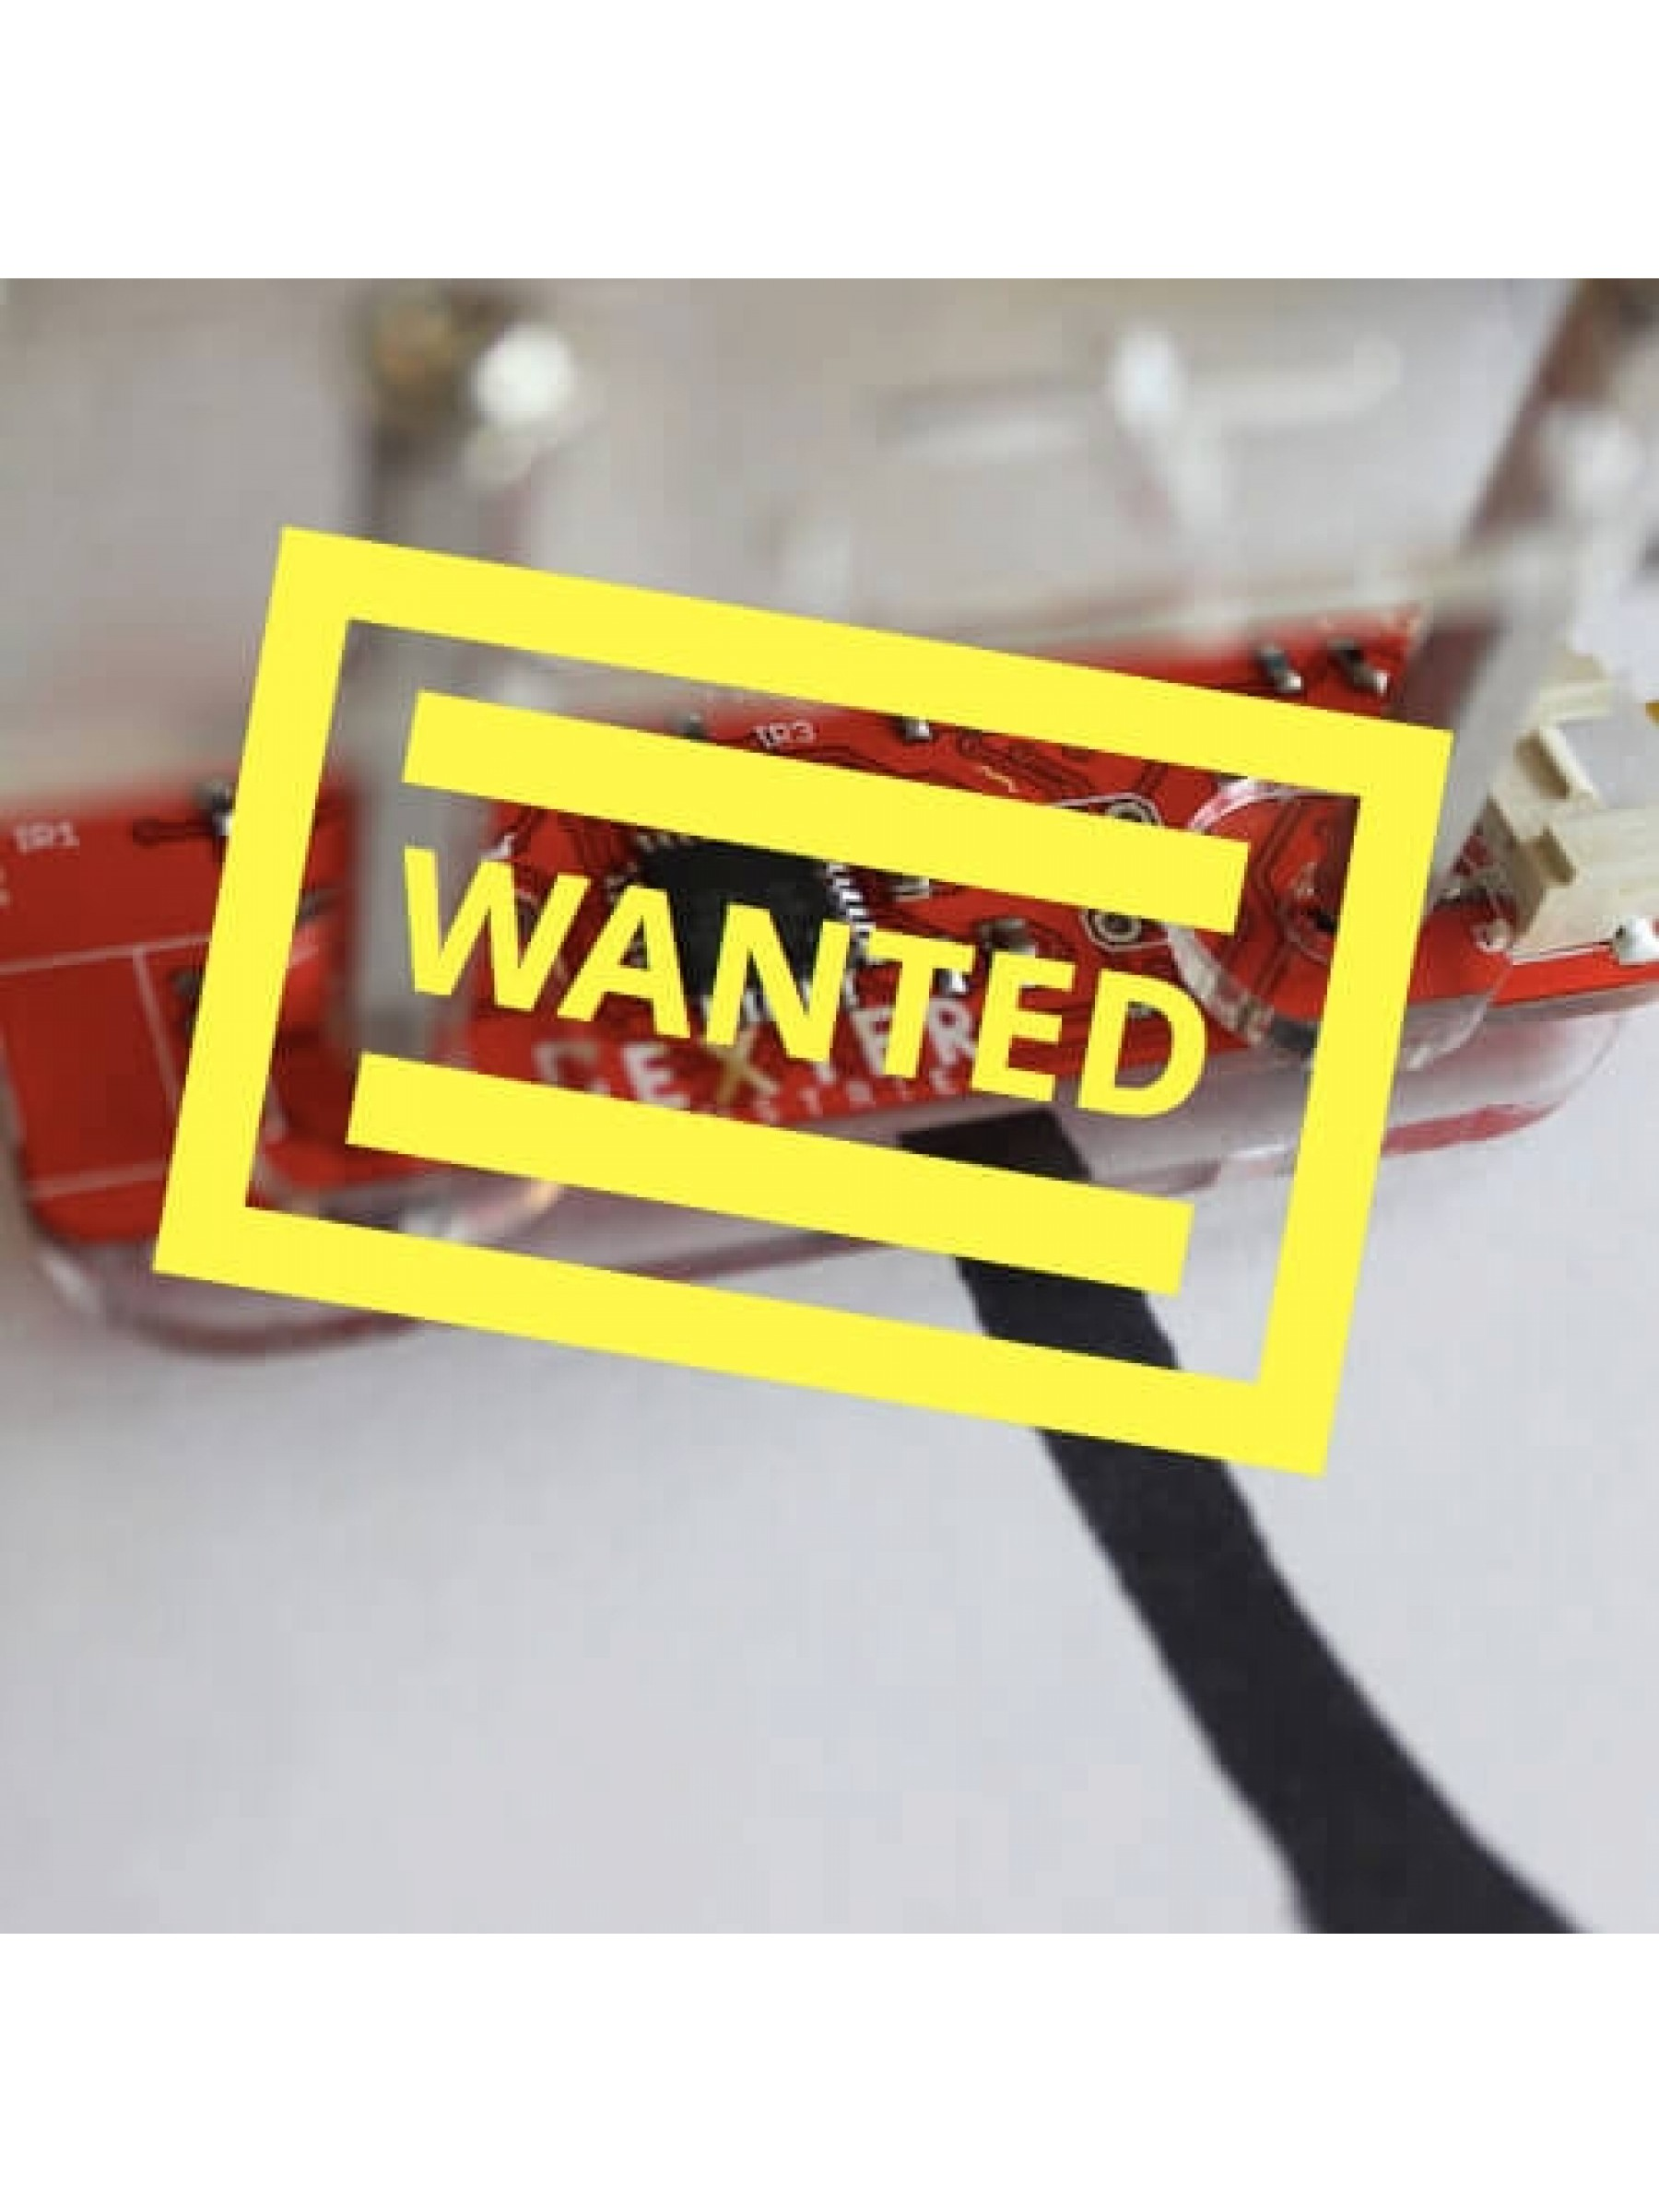 Wanted: Line Following Robot Hardware Kit